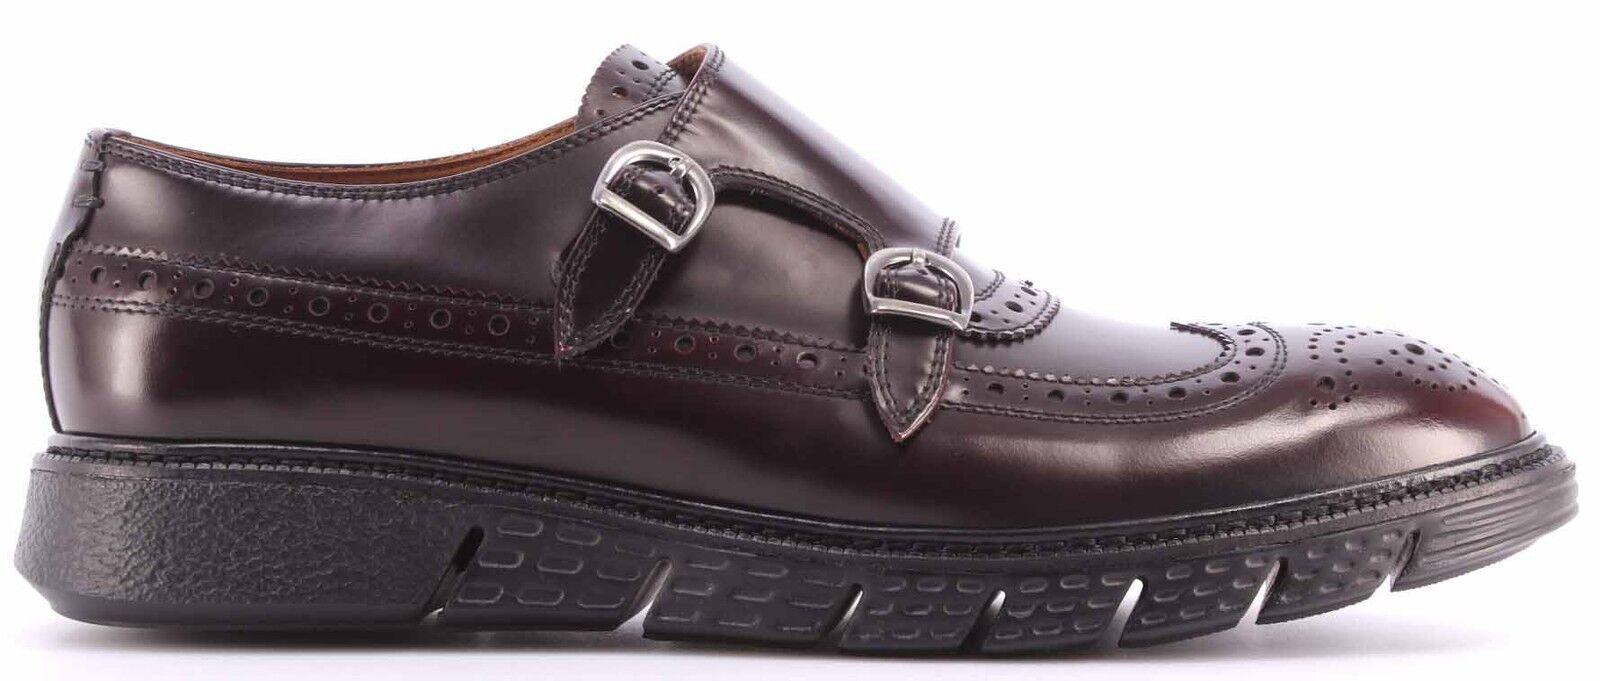 Herren klassisch Schuhe BARRACUDA BU2882A Abrasivato Bordo Bordeaux Bordeaux Bordeaux Schnallen a9ec7f